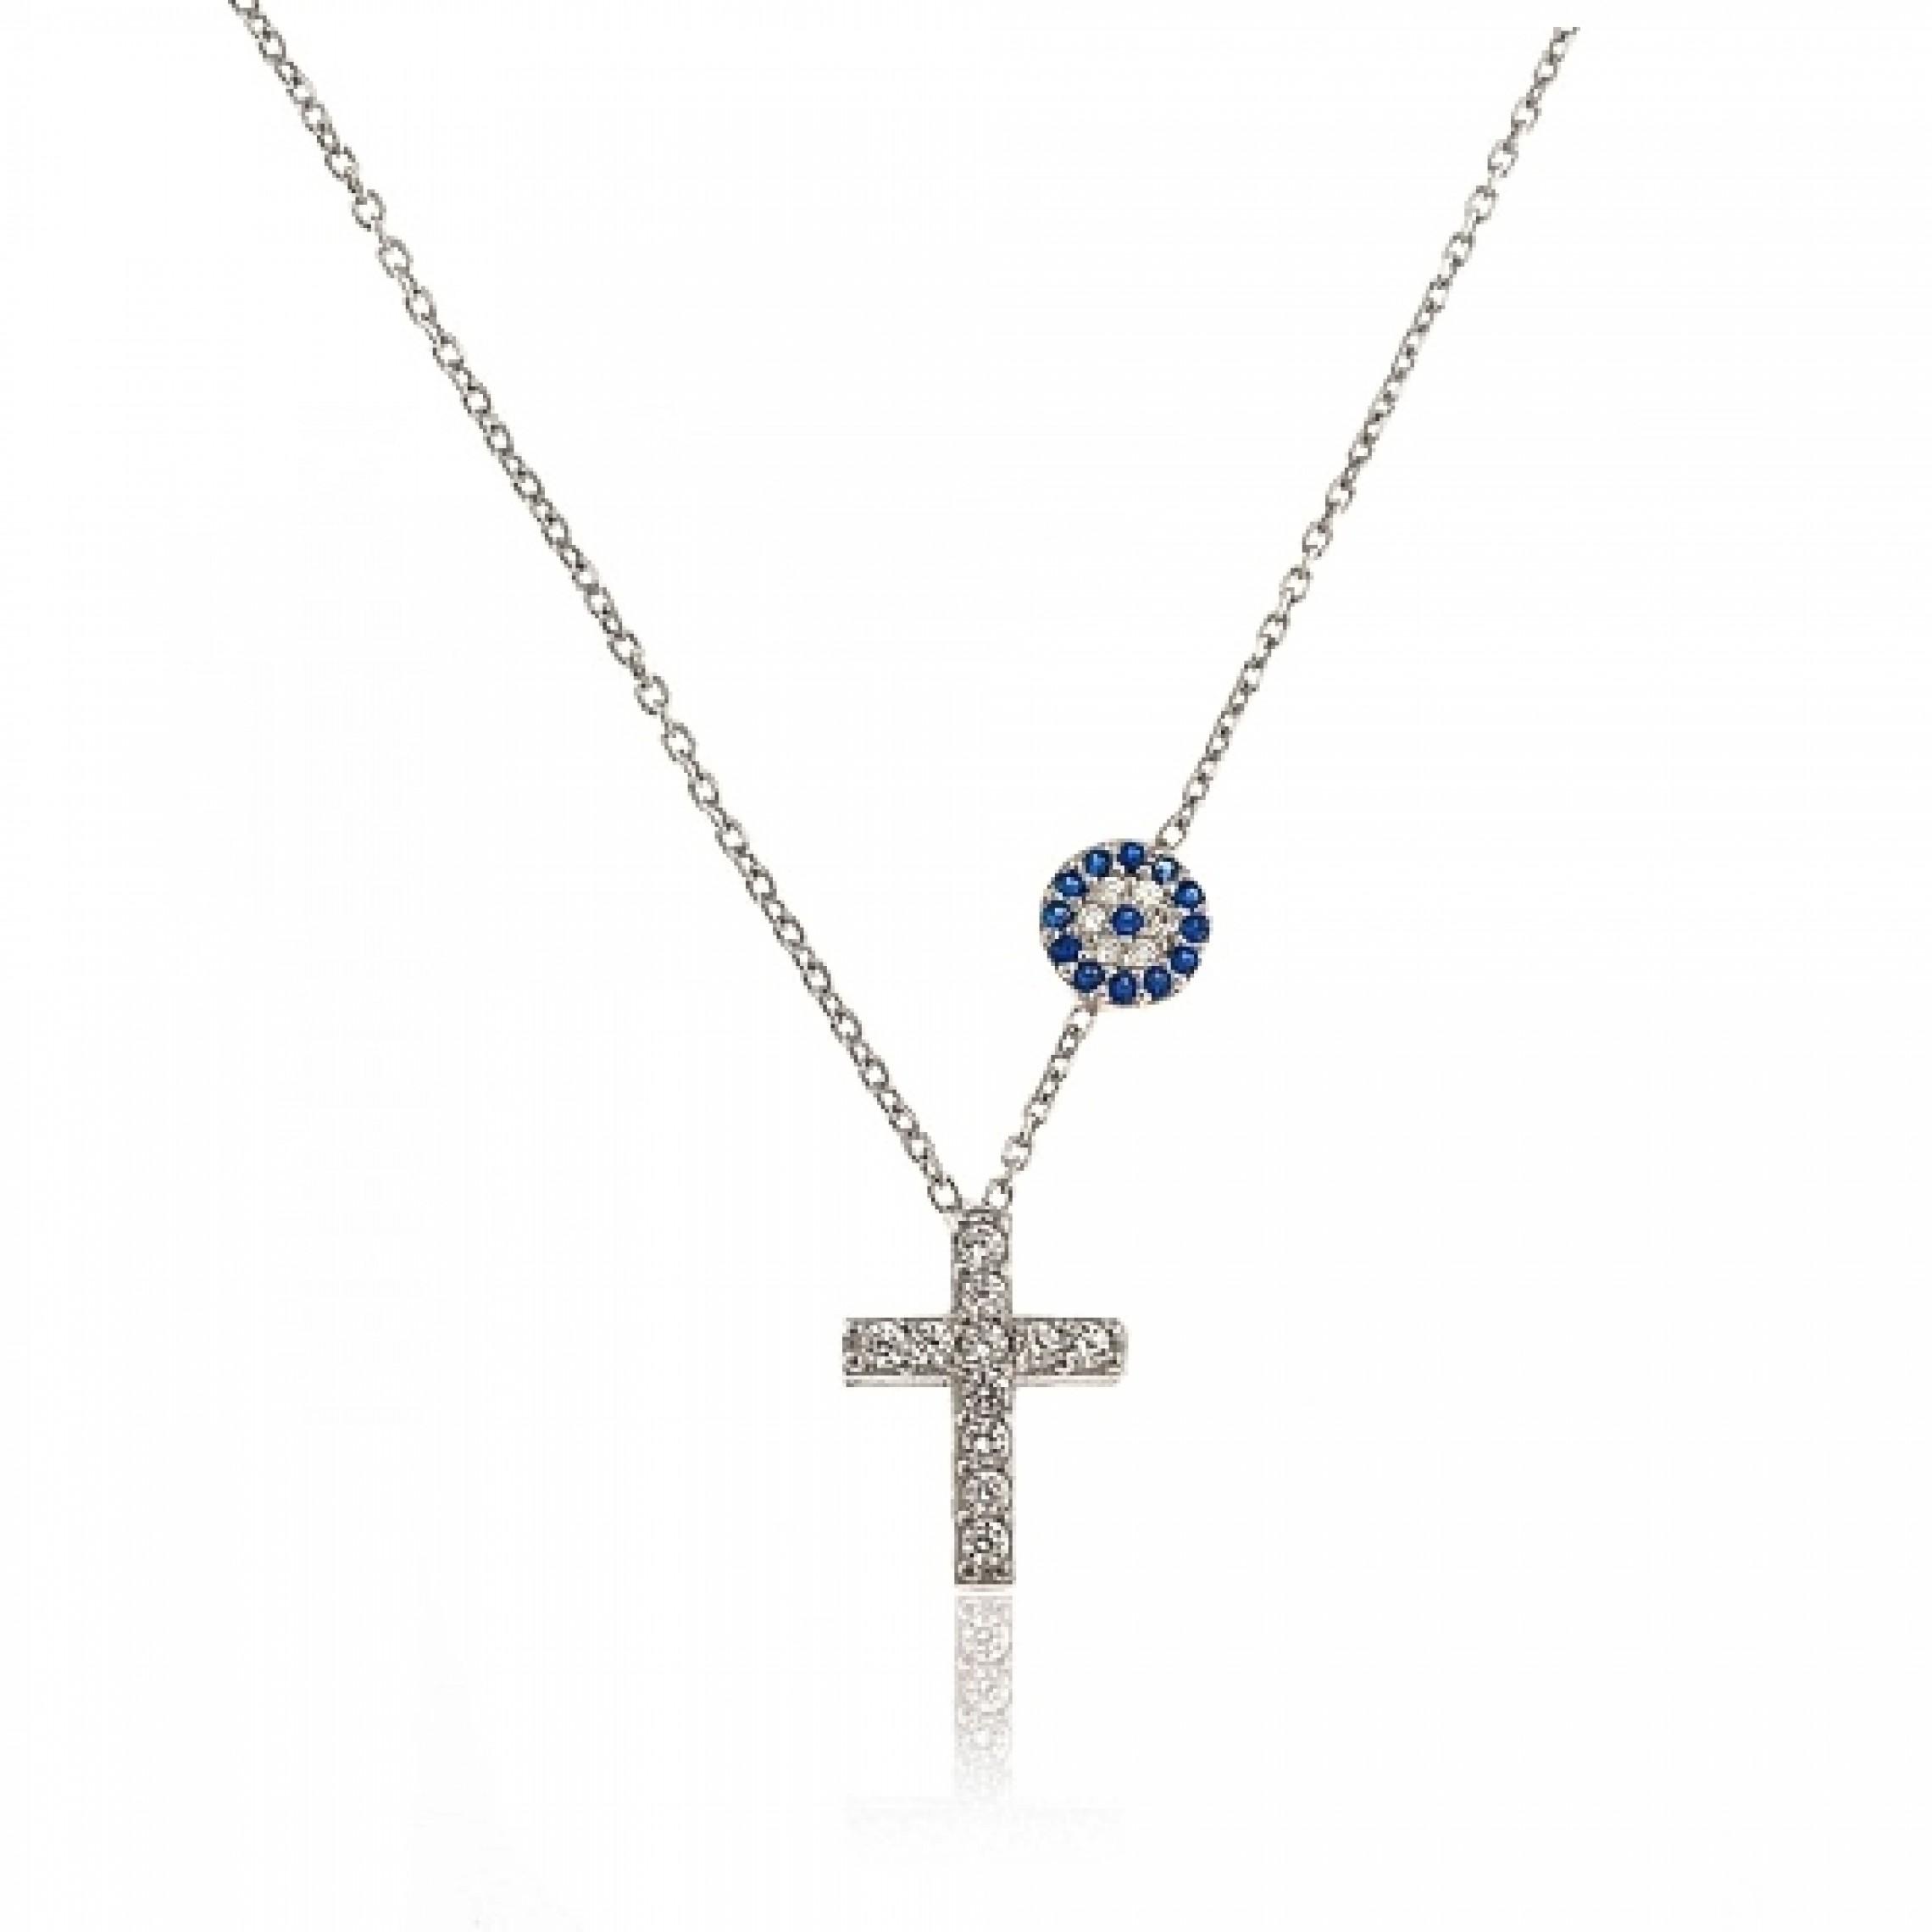 JN-190141 Evil Eye 925 Sterling Silver CZ Necklace Cross Eyes